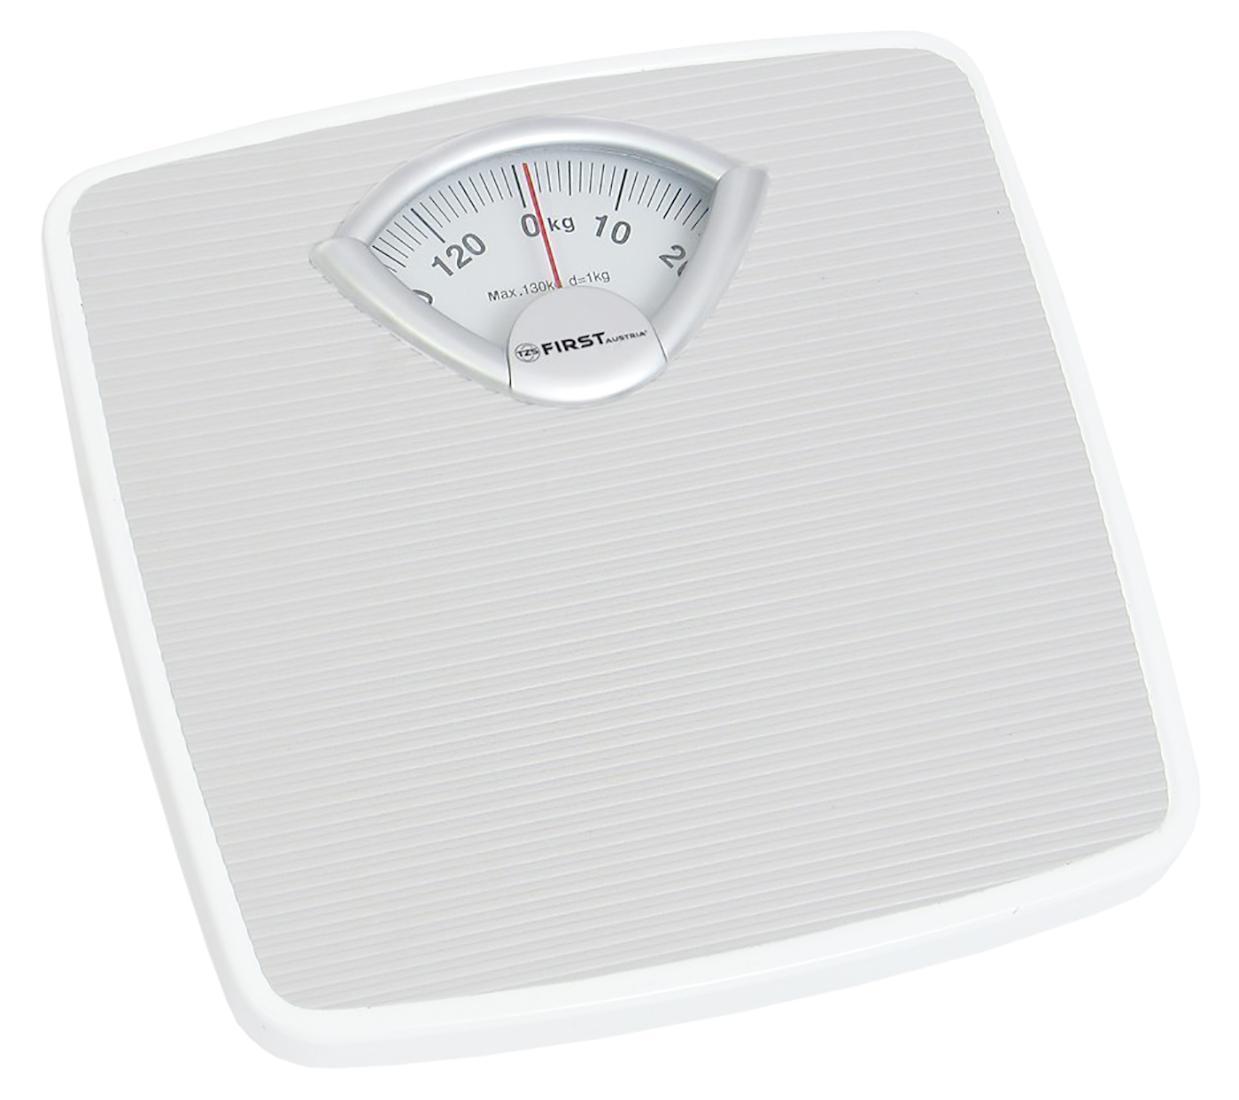 First FA-8004-1, White весы напольныеFA-8004-1 White8004-1 Весы напольные FIRST, механика, пластик., 130 кг, 1 кг, White